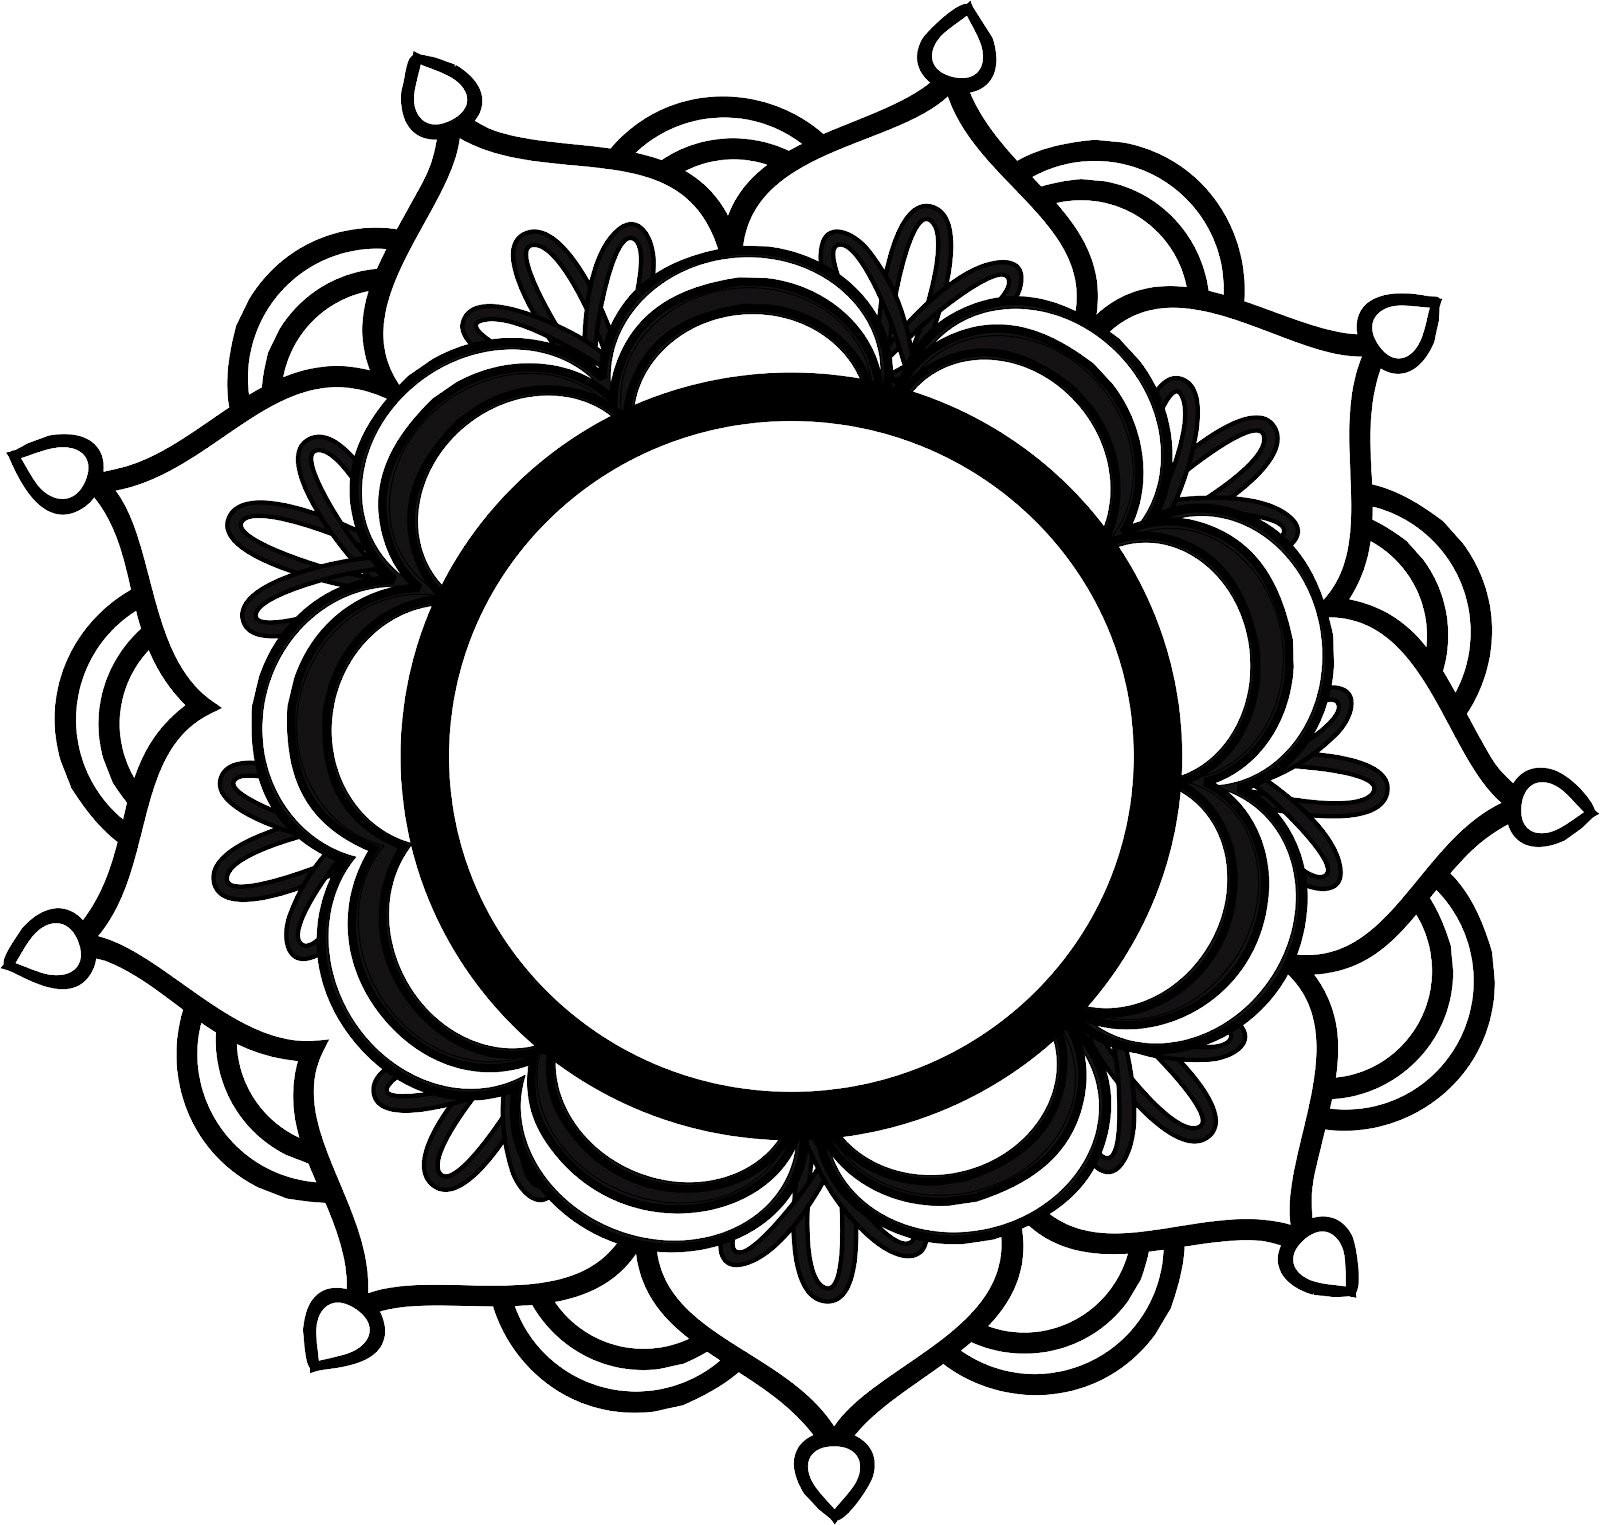 Cool Tattoo Design Outline